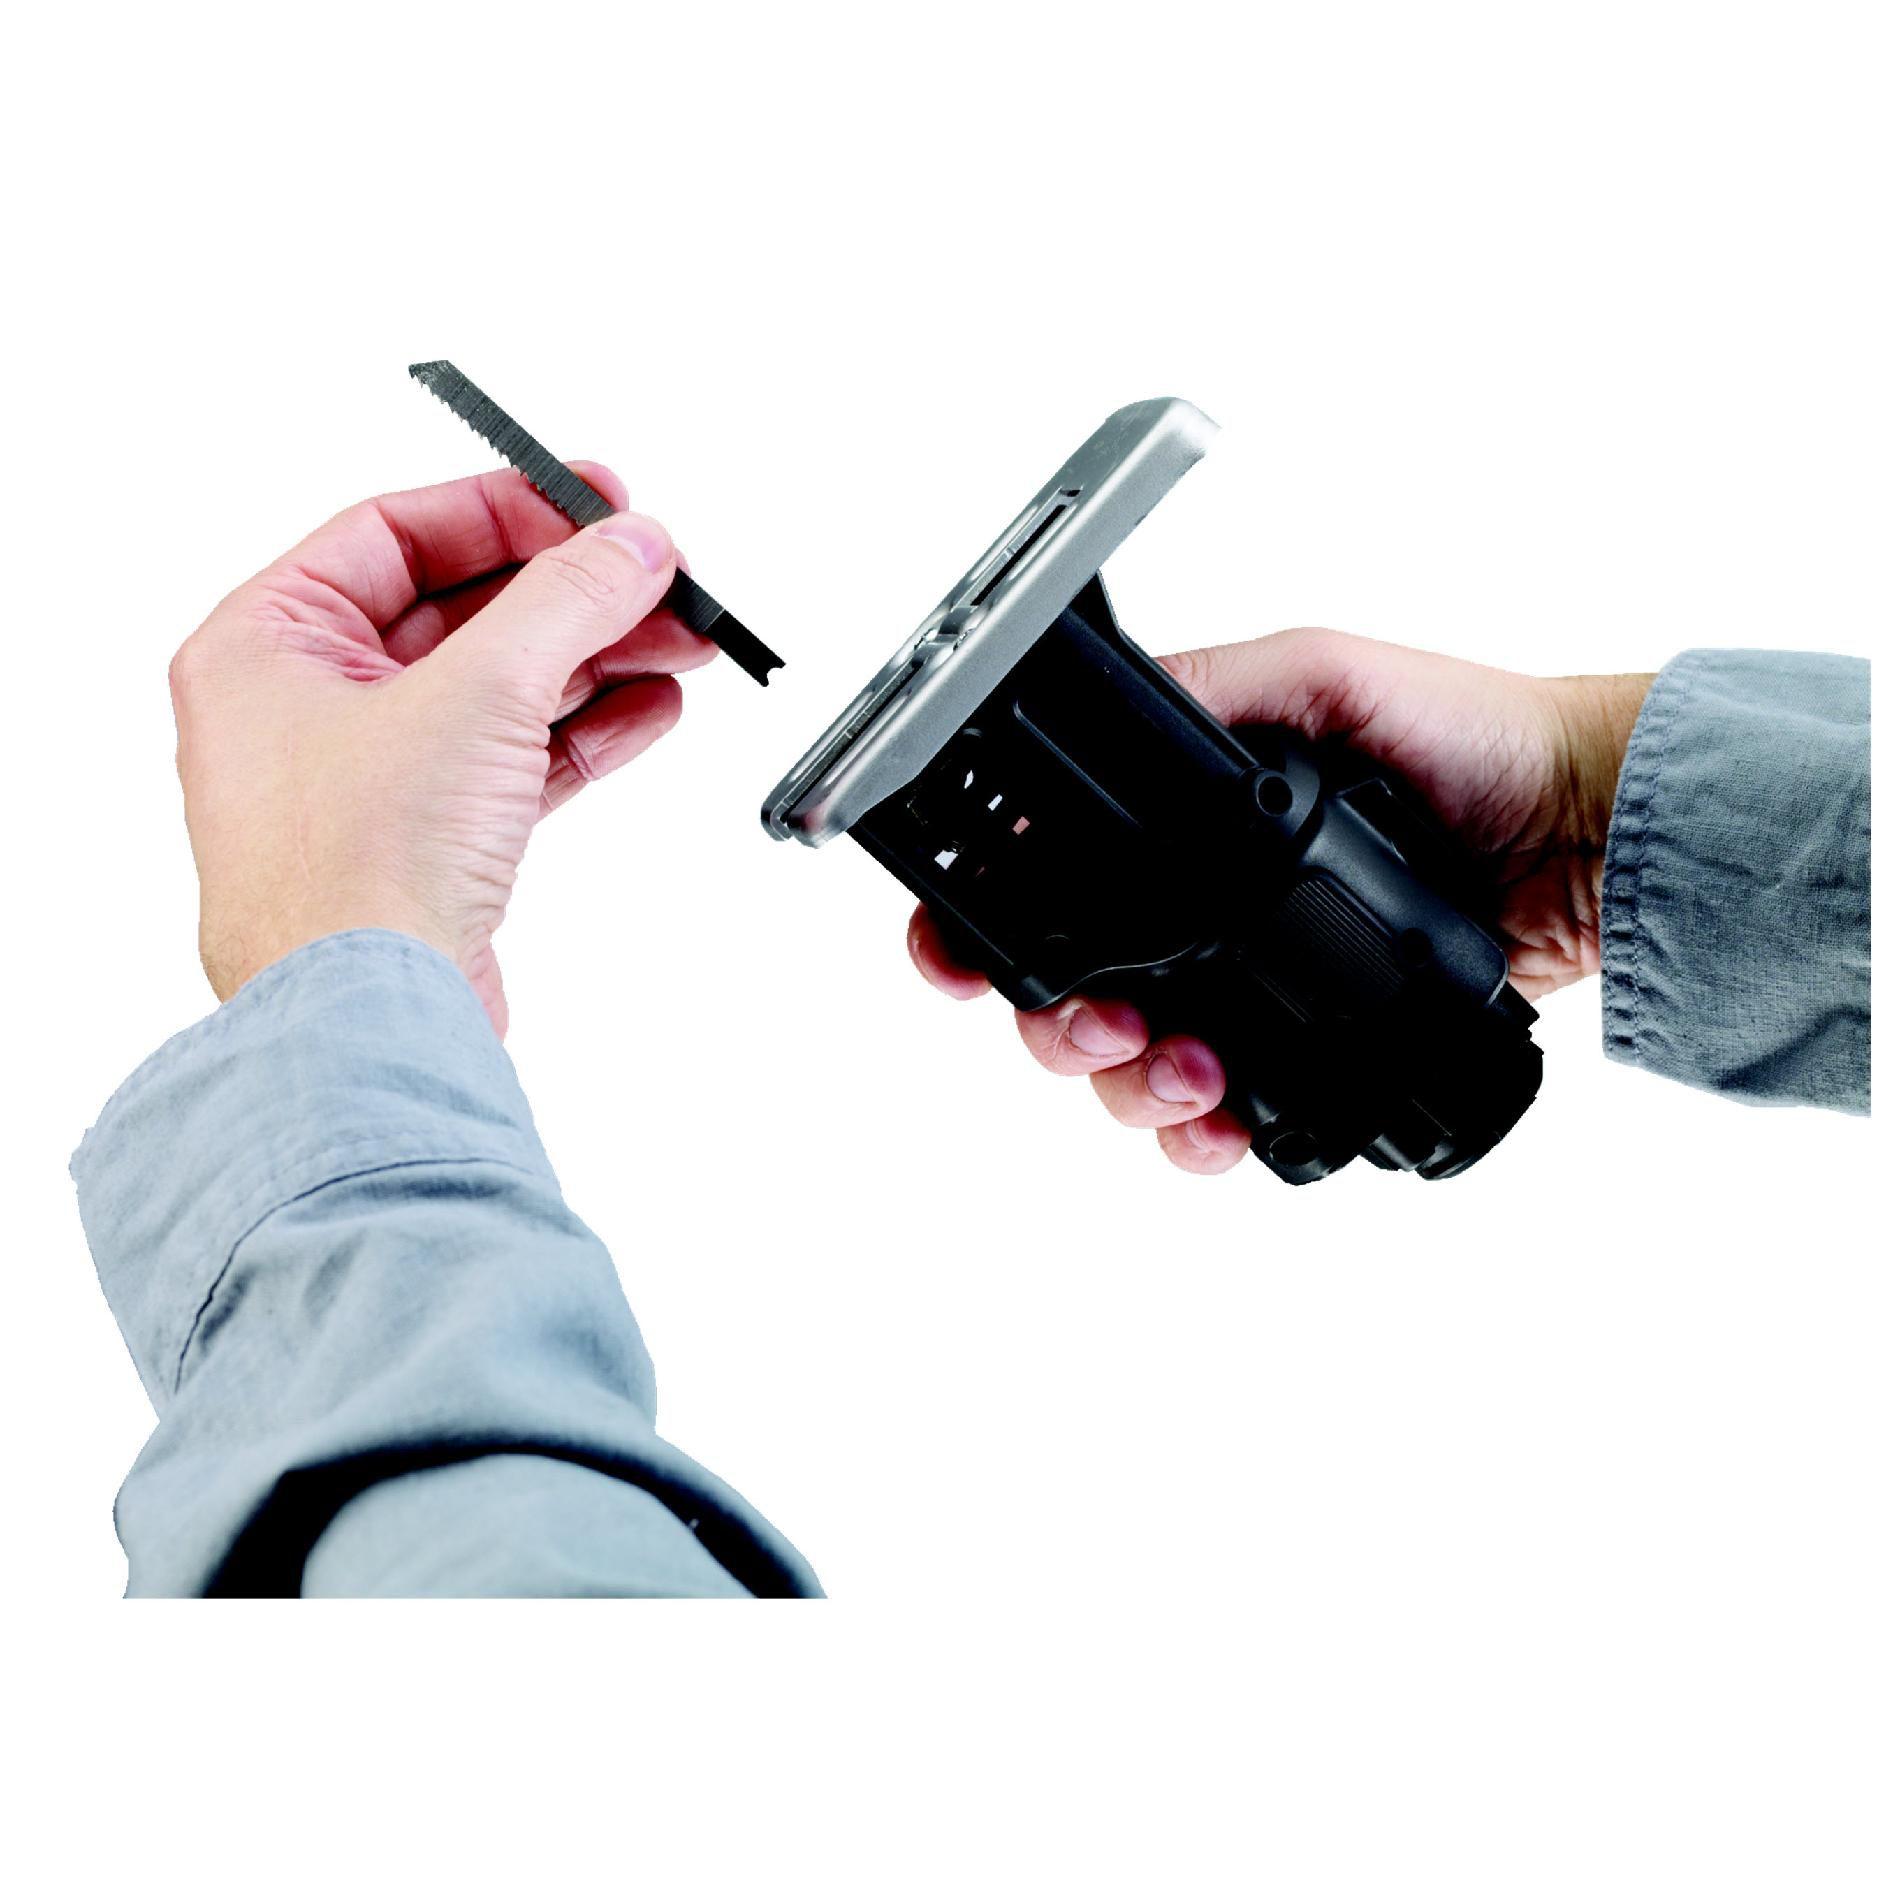 Craftsman Bolt-On ™ Jig Saw Attachment